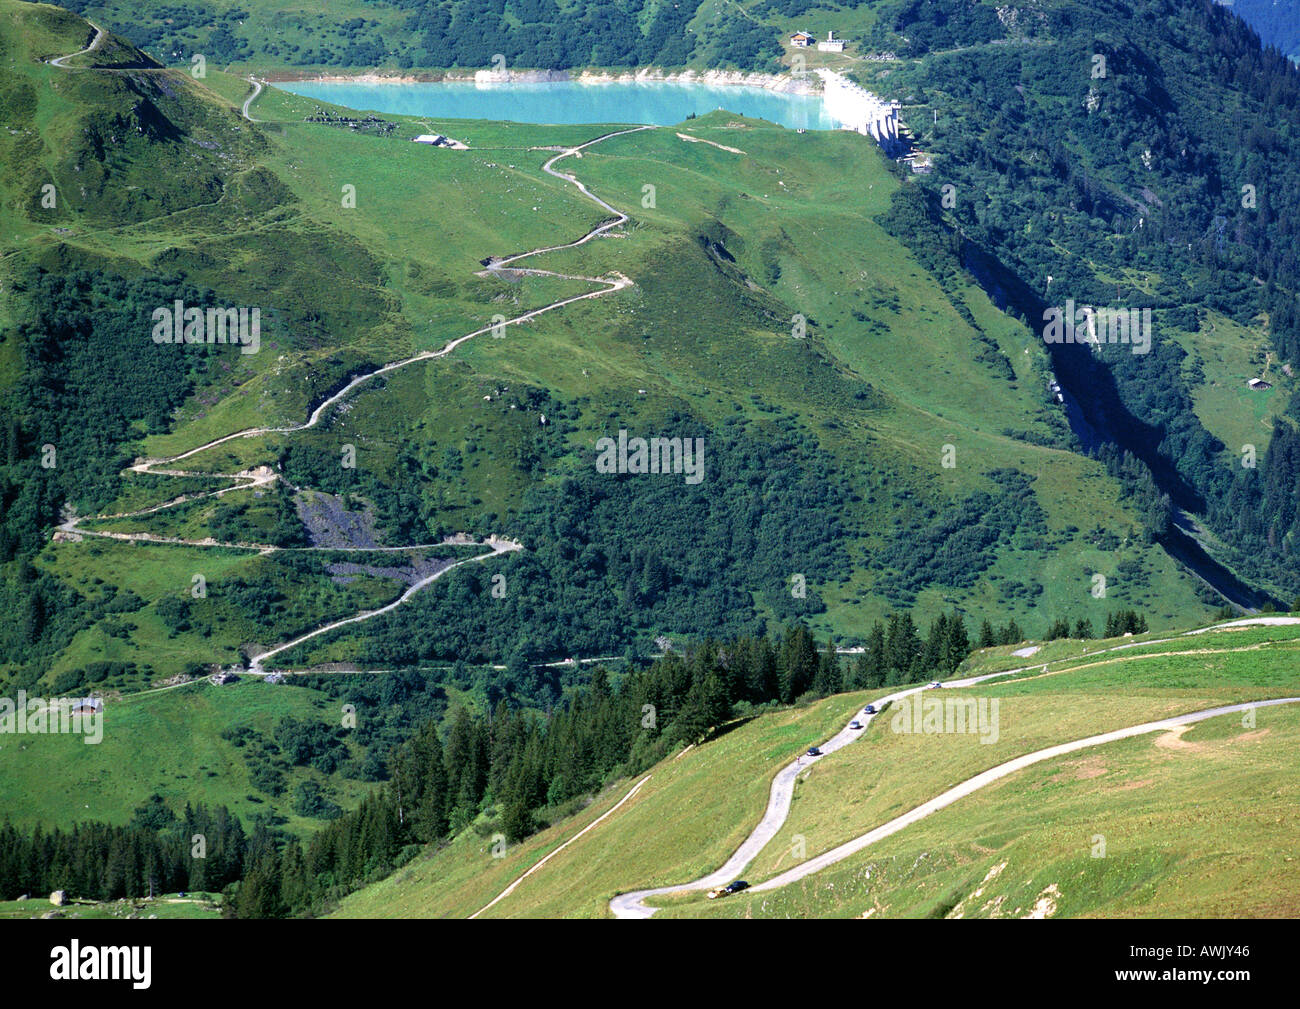 France, Savoie, roads through mountains, one leading to blue lake - Stock Image